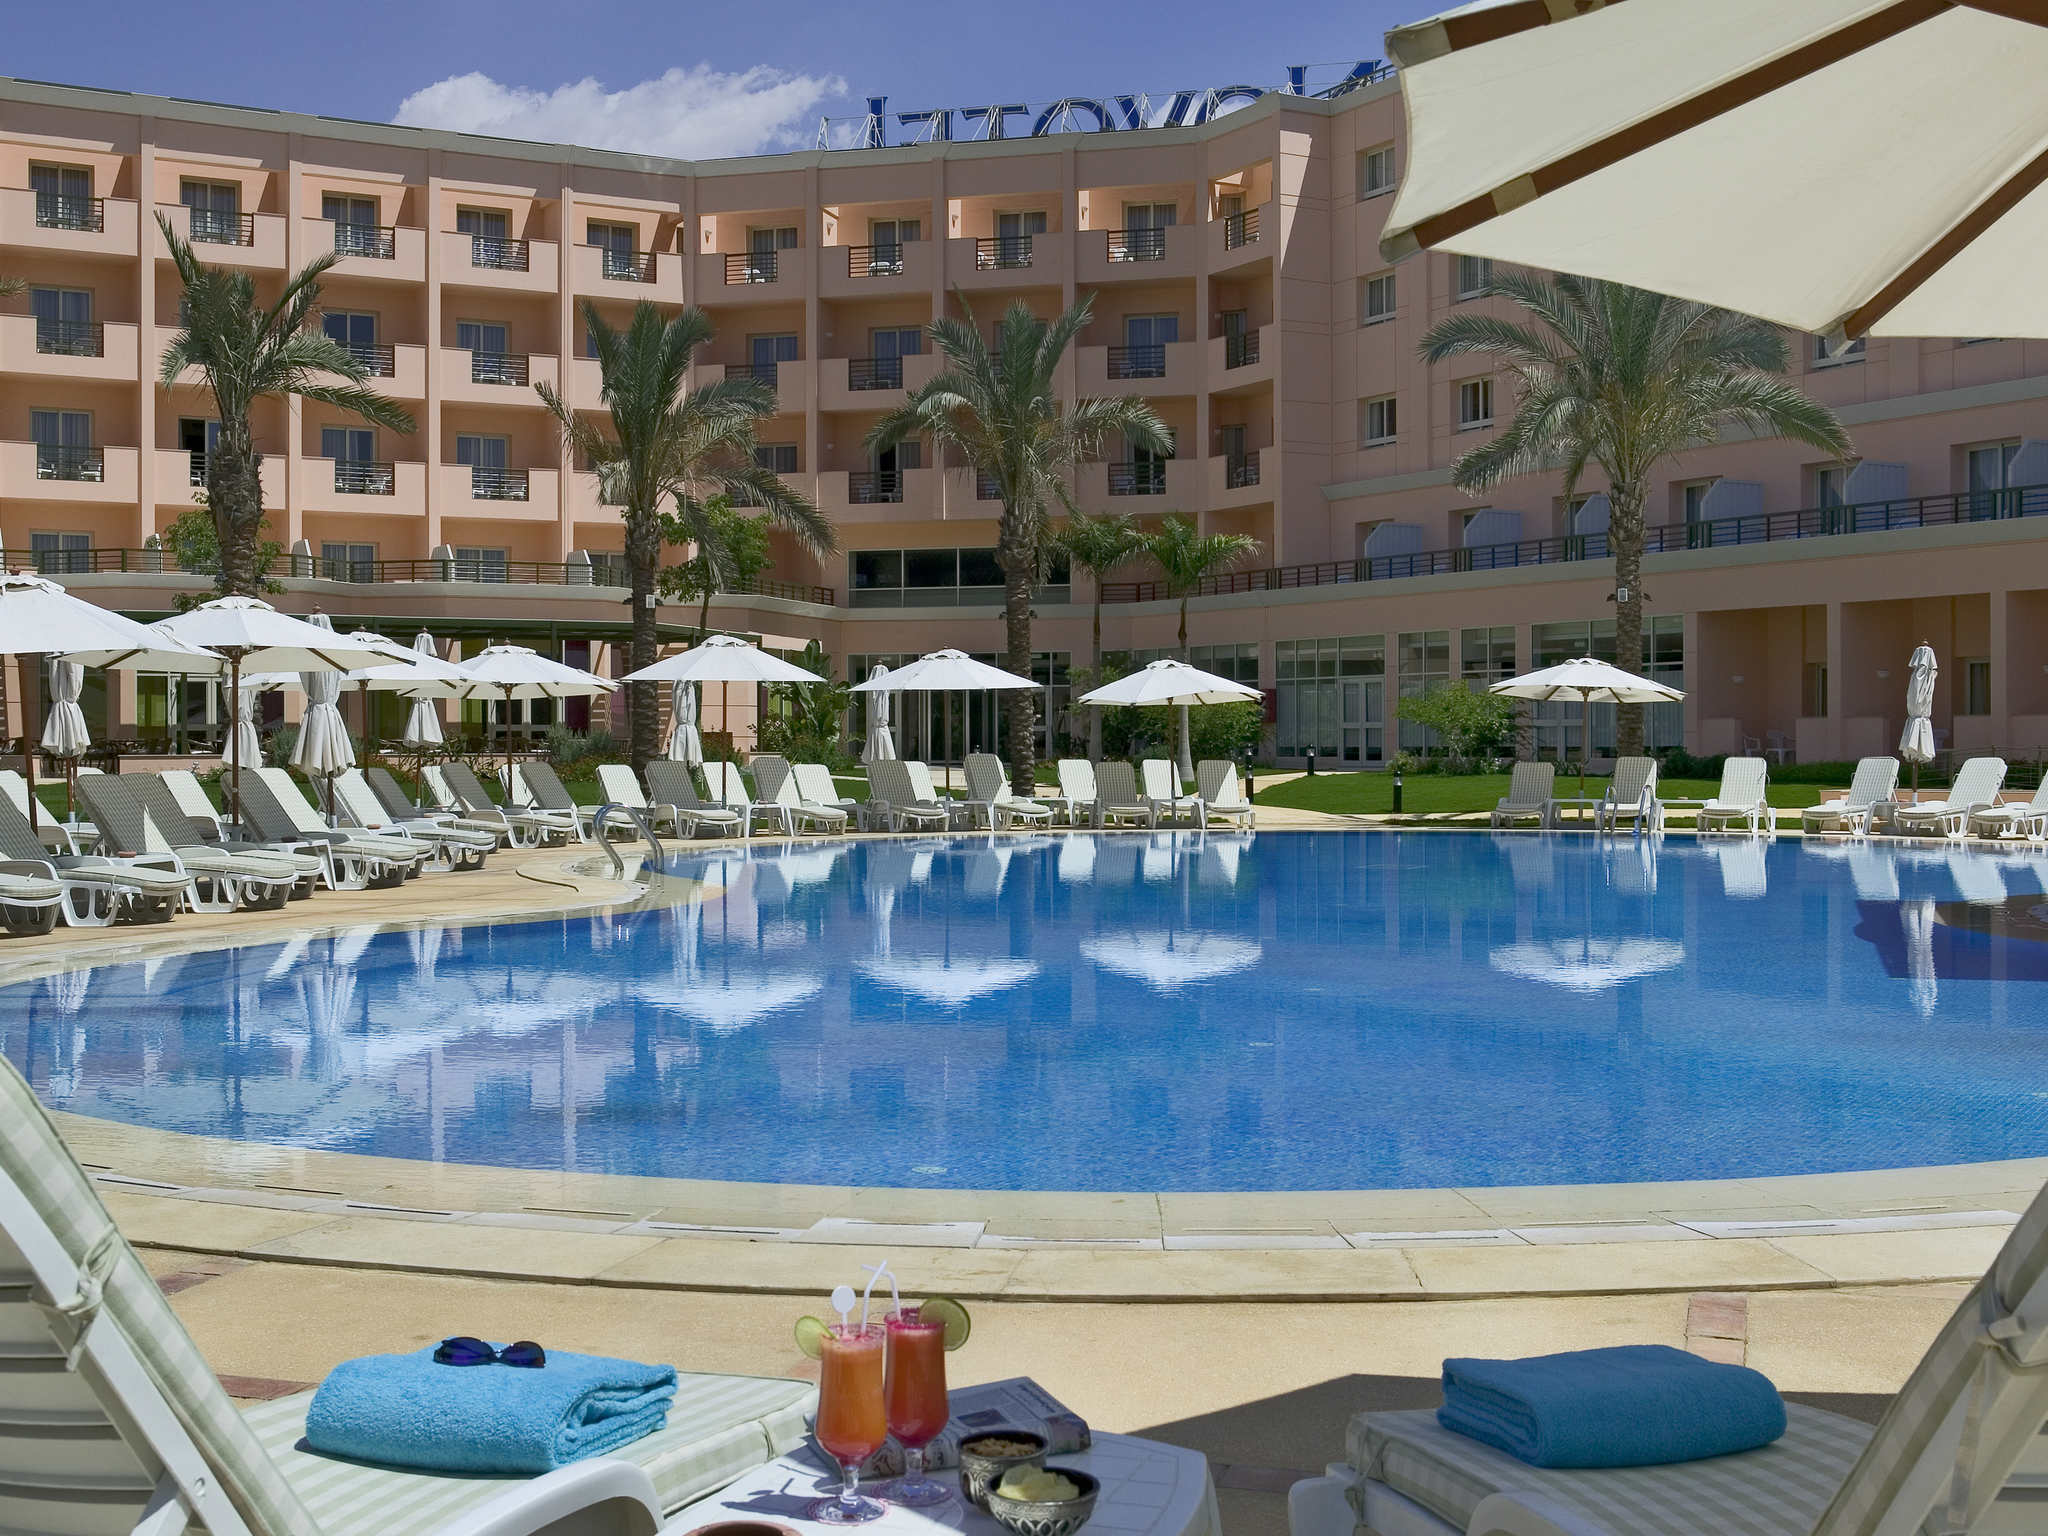 hotel in cairo novotel cairo 6th of october